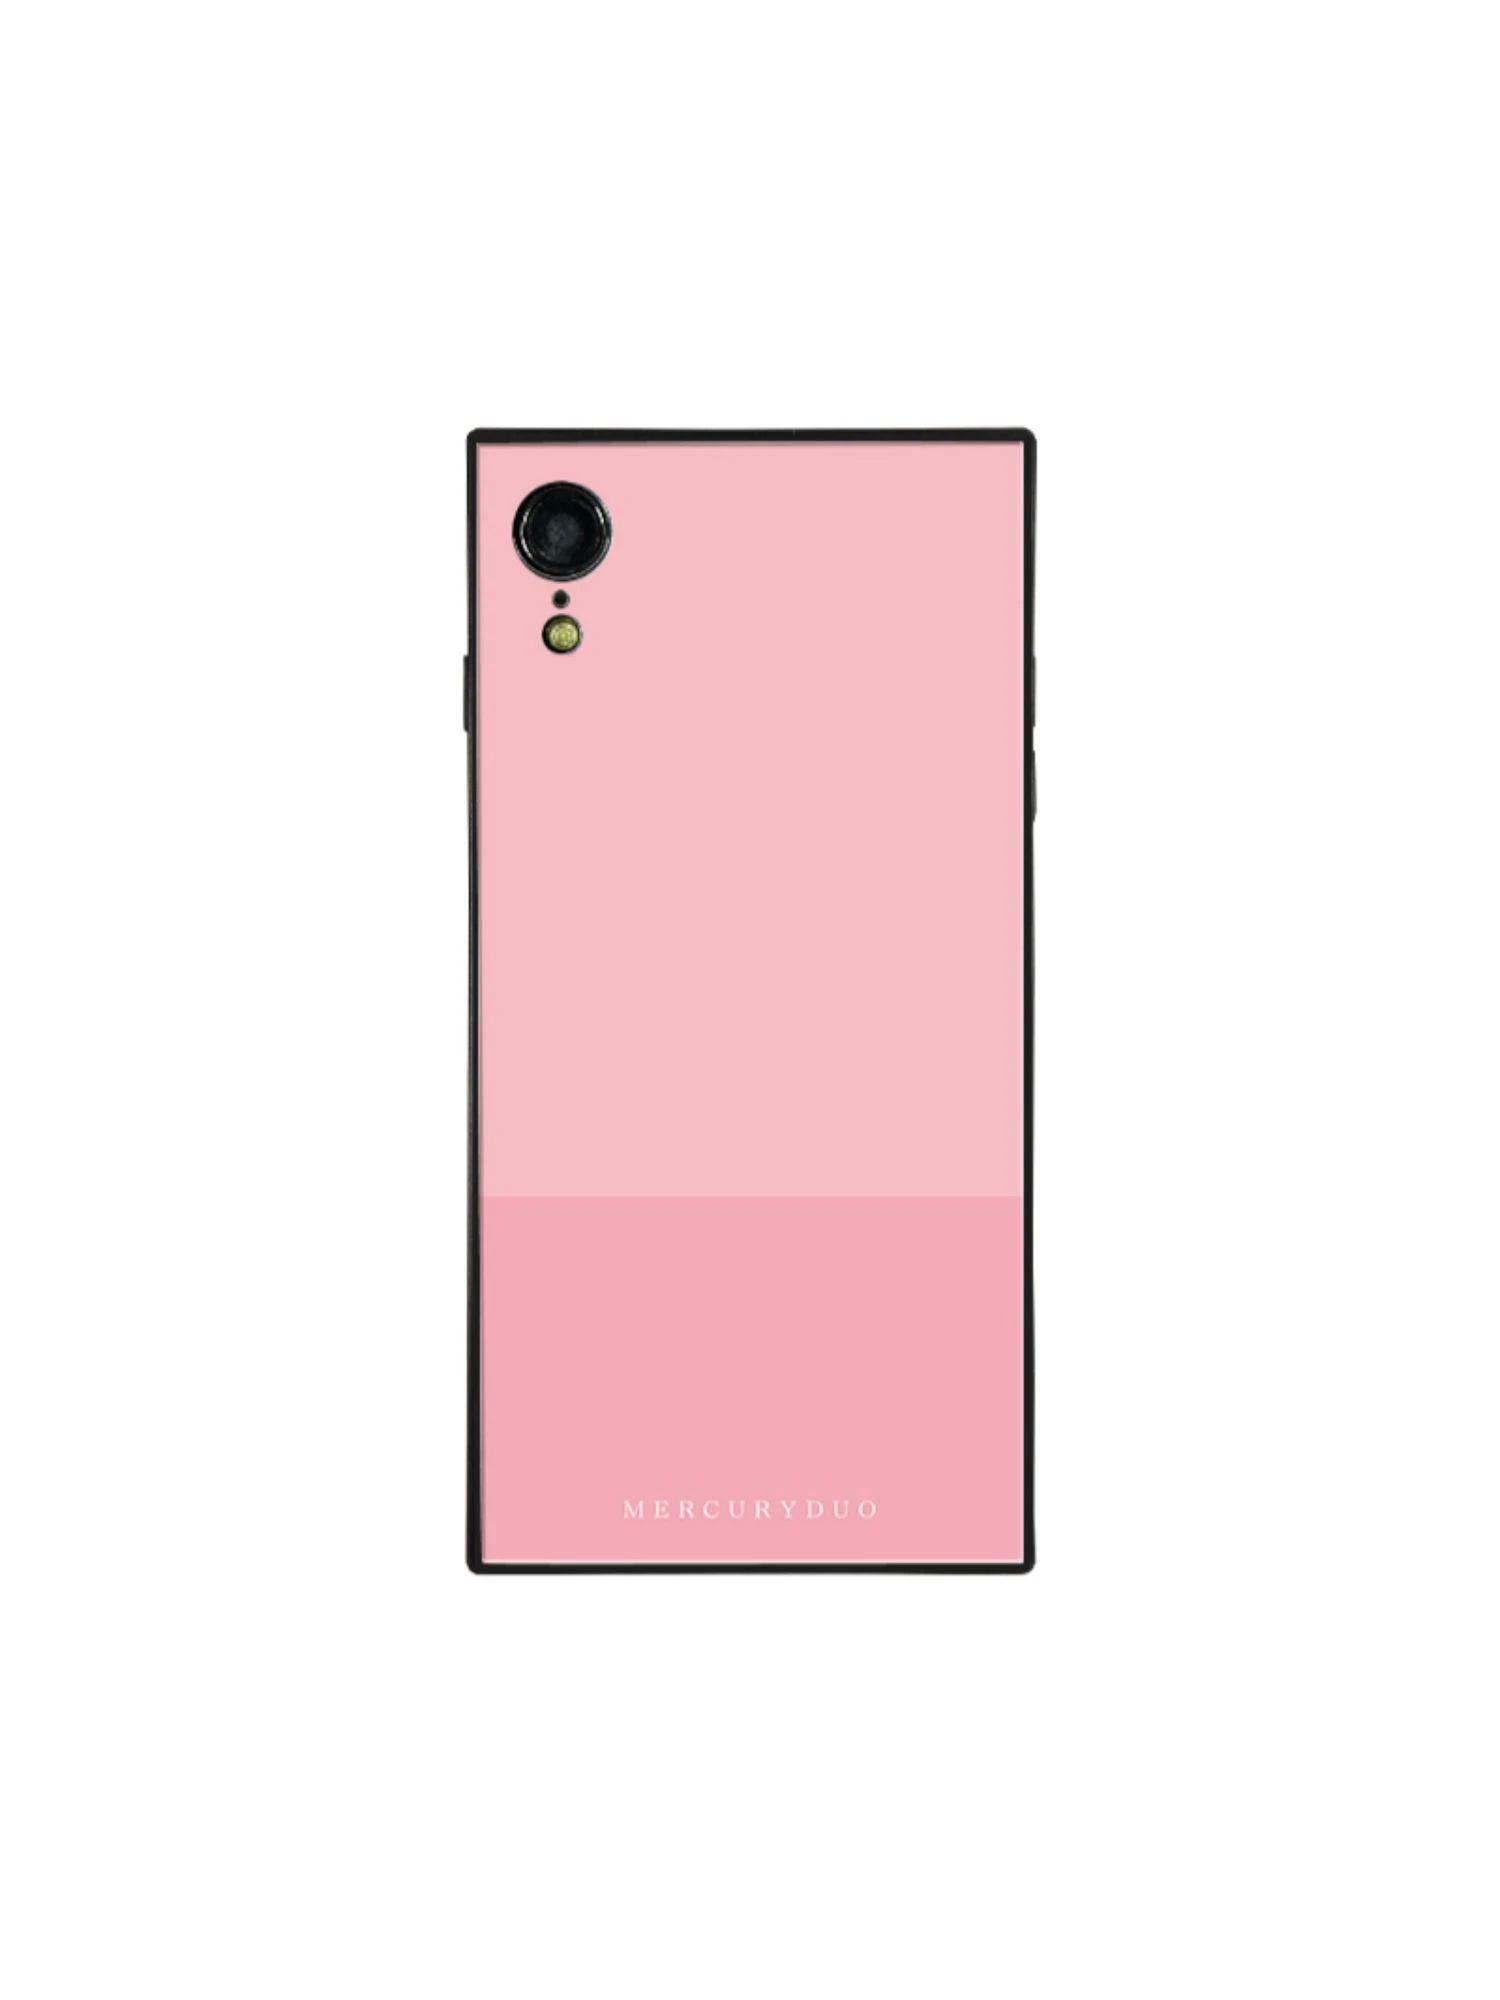 【MERCURYDUO】バイカラー iphone-XR スマホケース